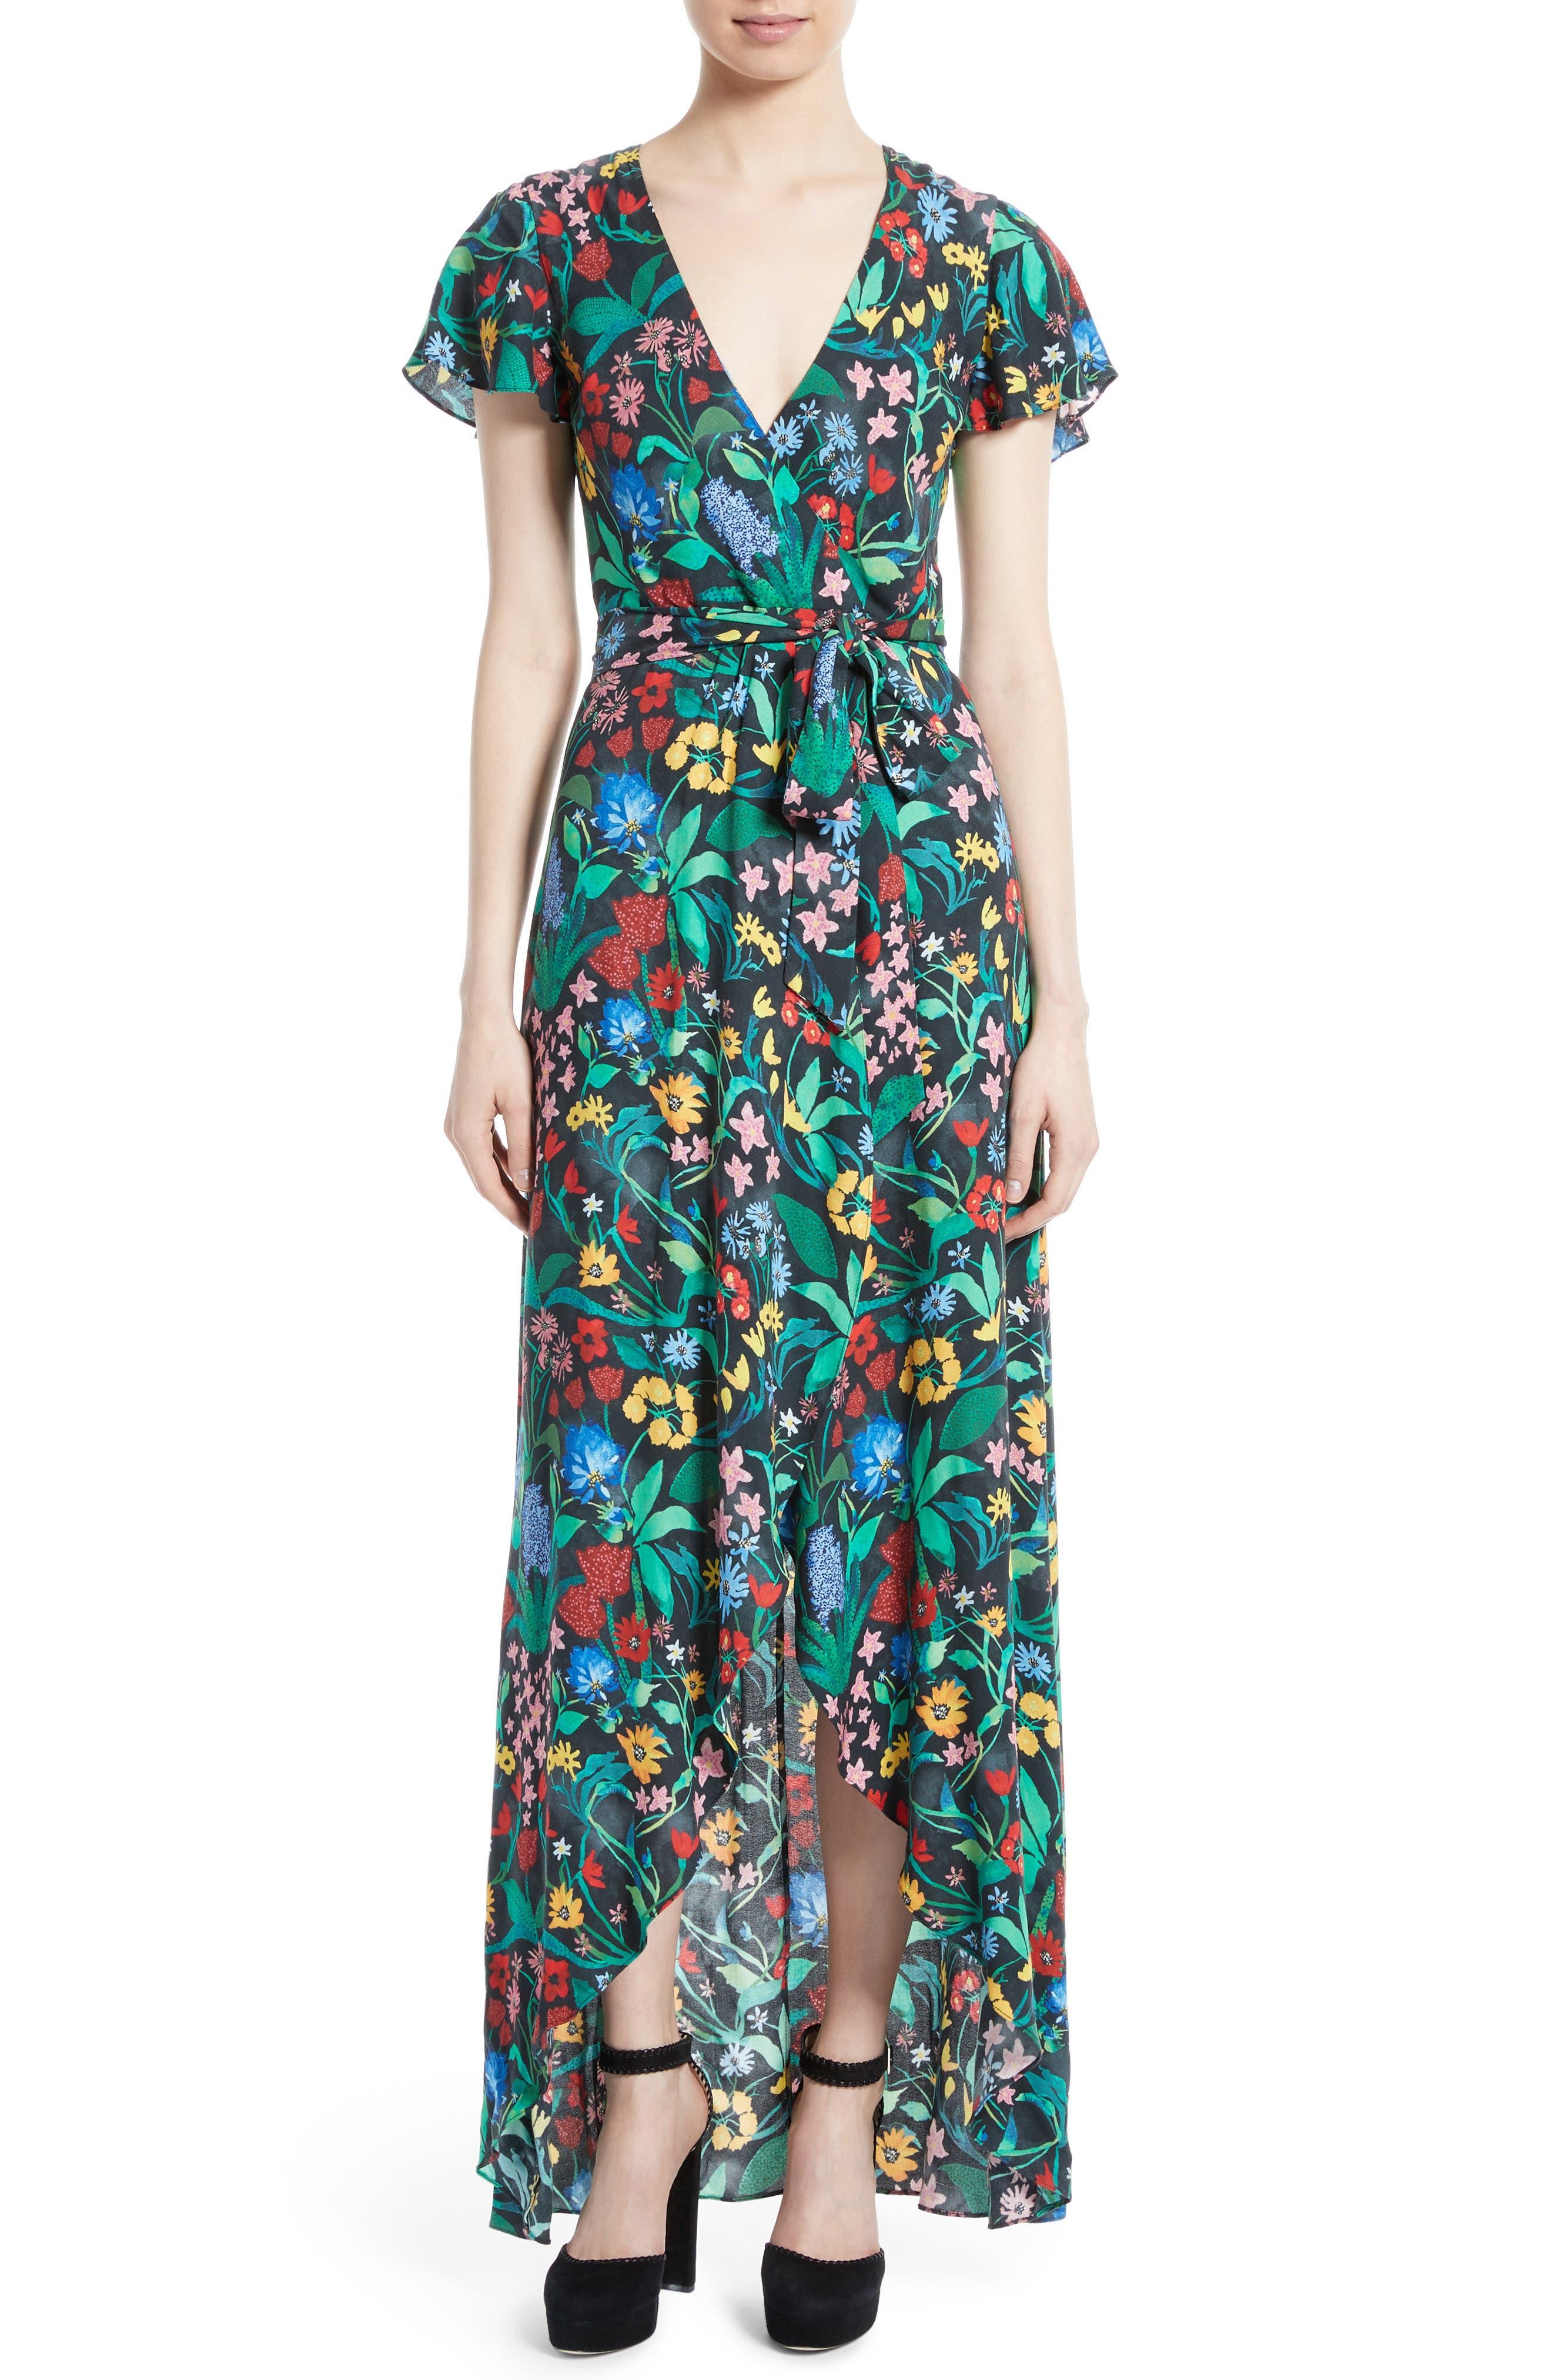 Alternate Image 1 Selected - Alice + Olivia Adrianna Floral Faux Wrap Maxi Dress